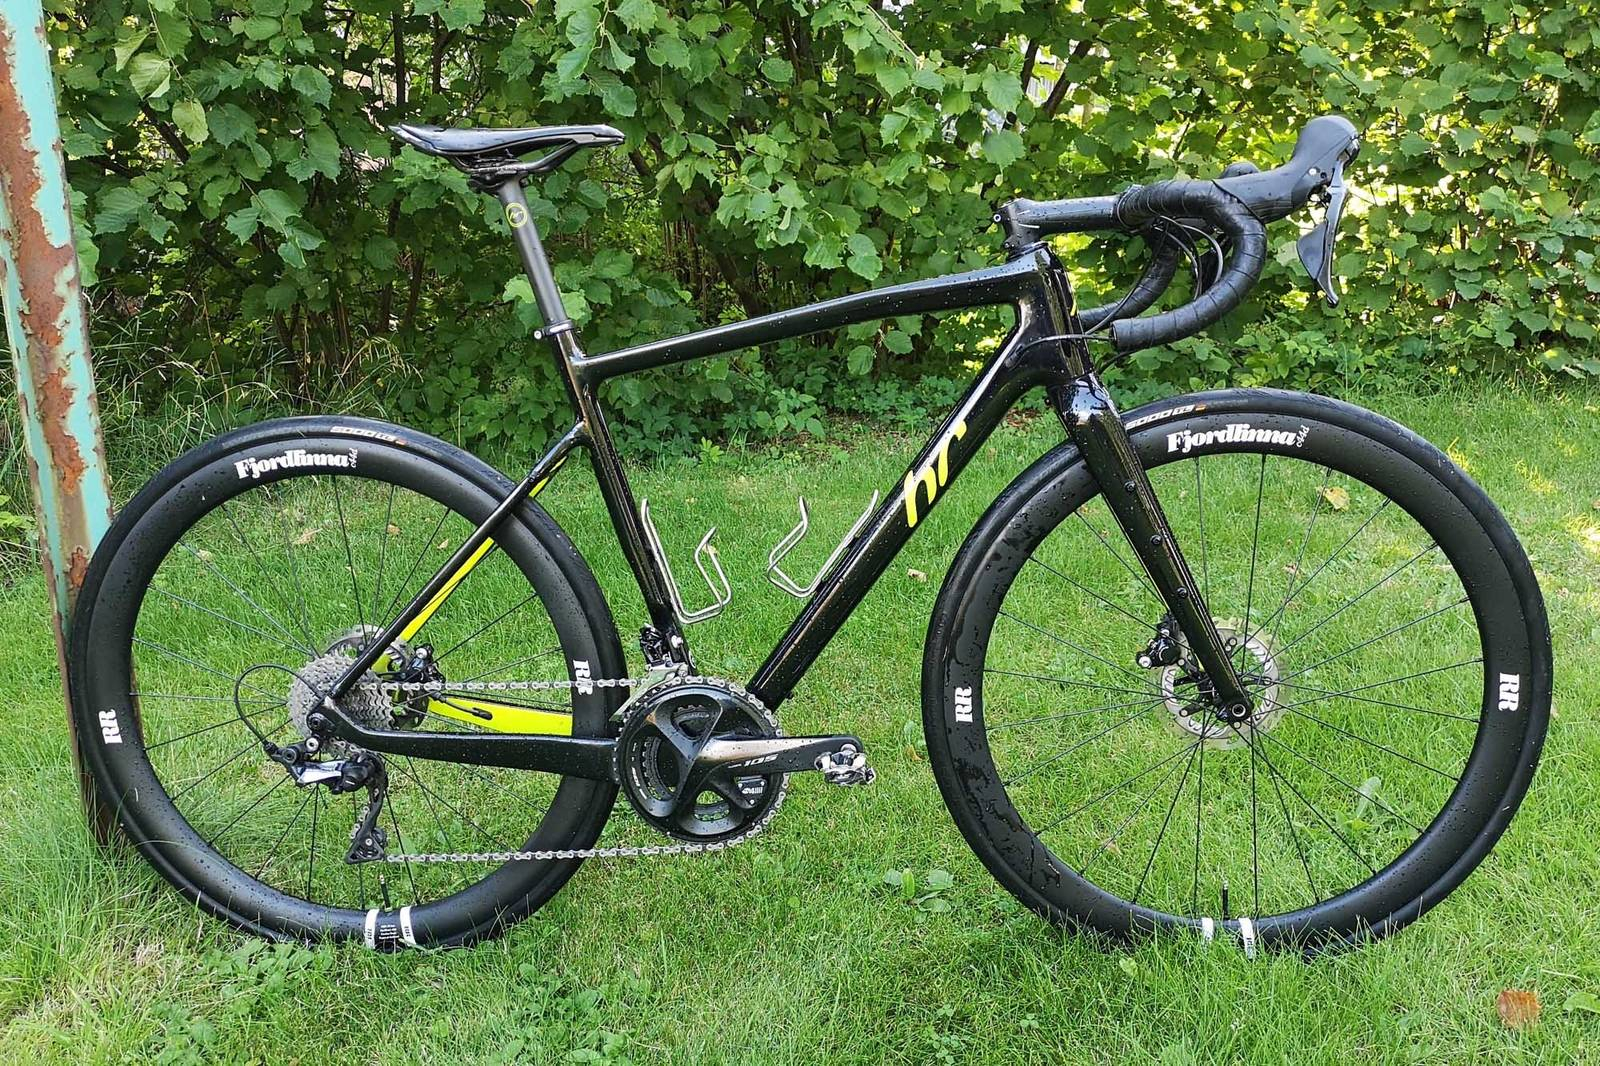 fredrik haraldseth hard rocx sykkel